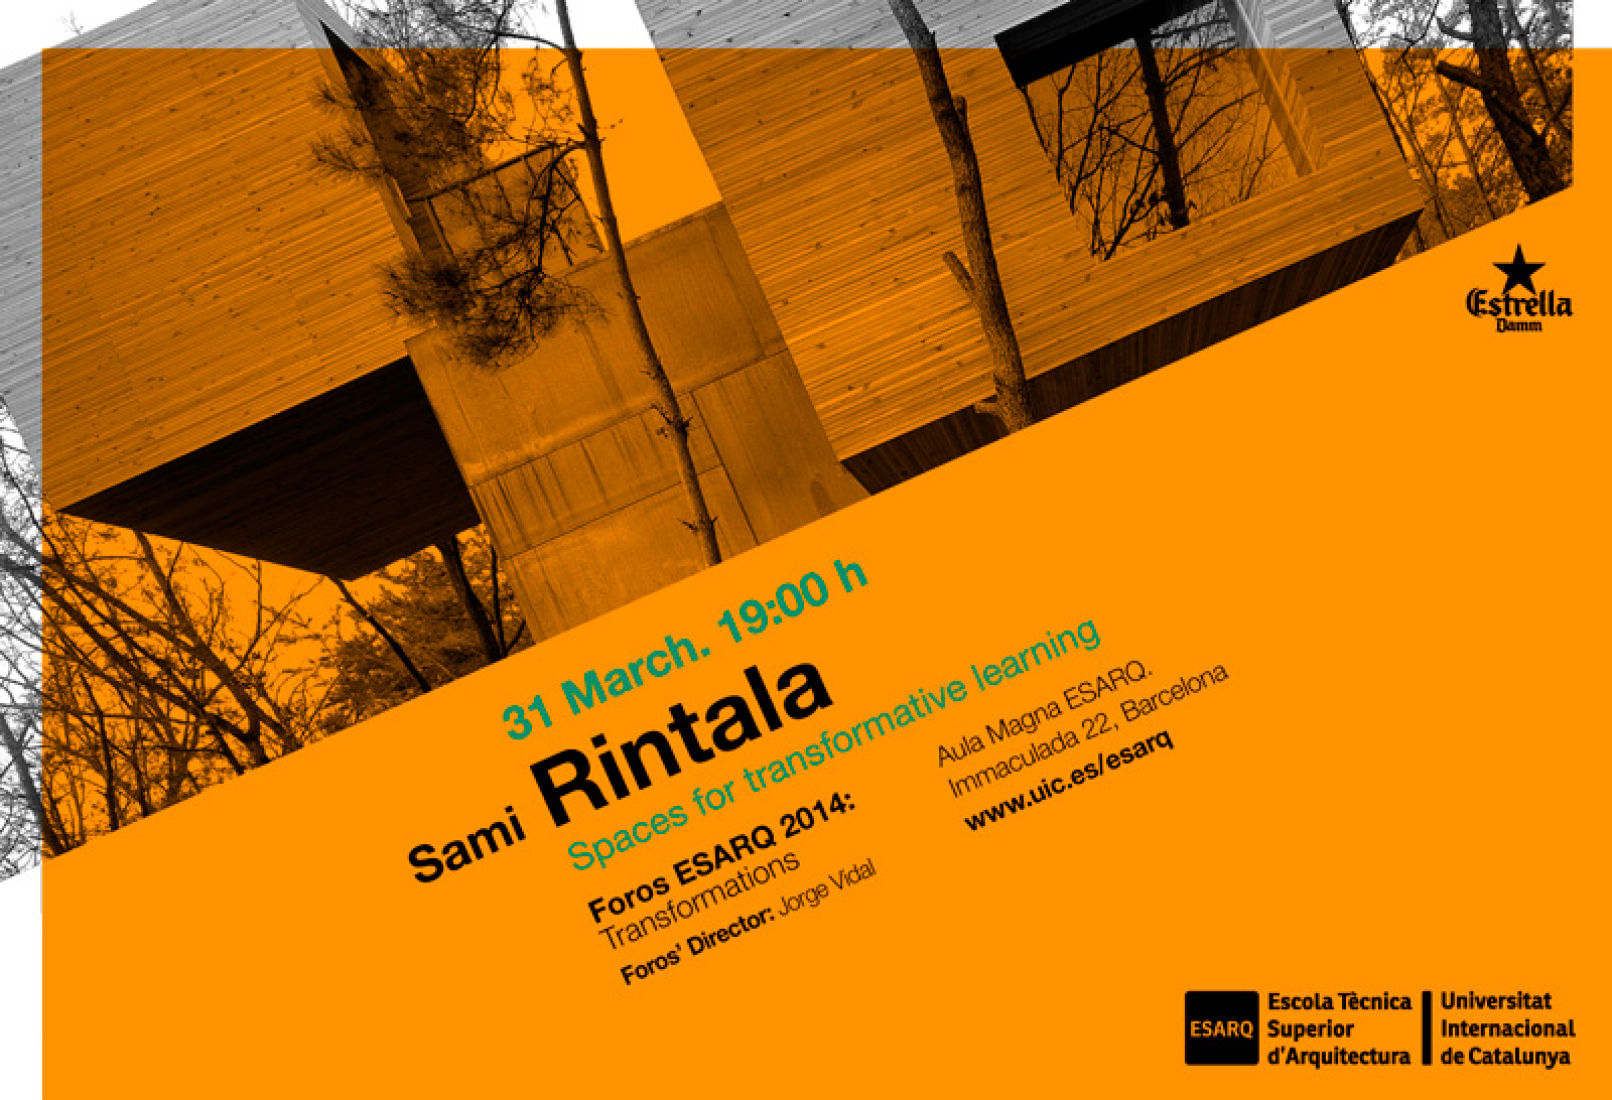 "Sami Rintala. Lecture Poster. ""Foros Esarq 2014: Transformations"". Courtesy of Marta Poch."